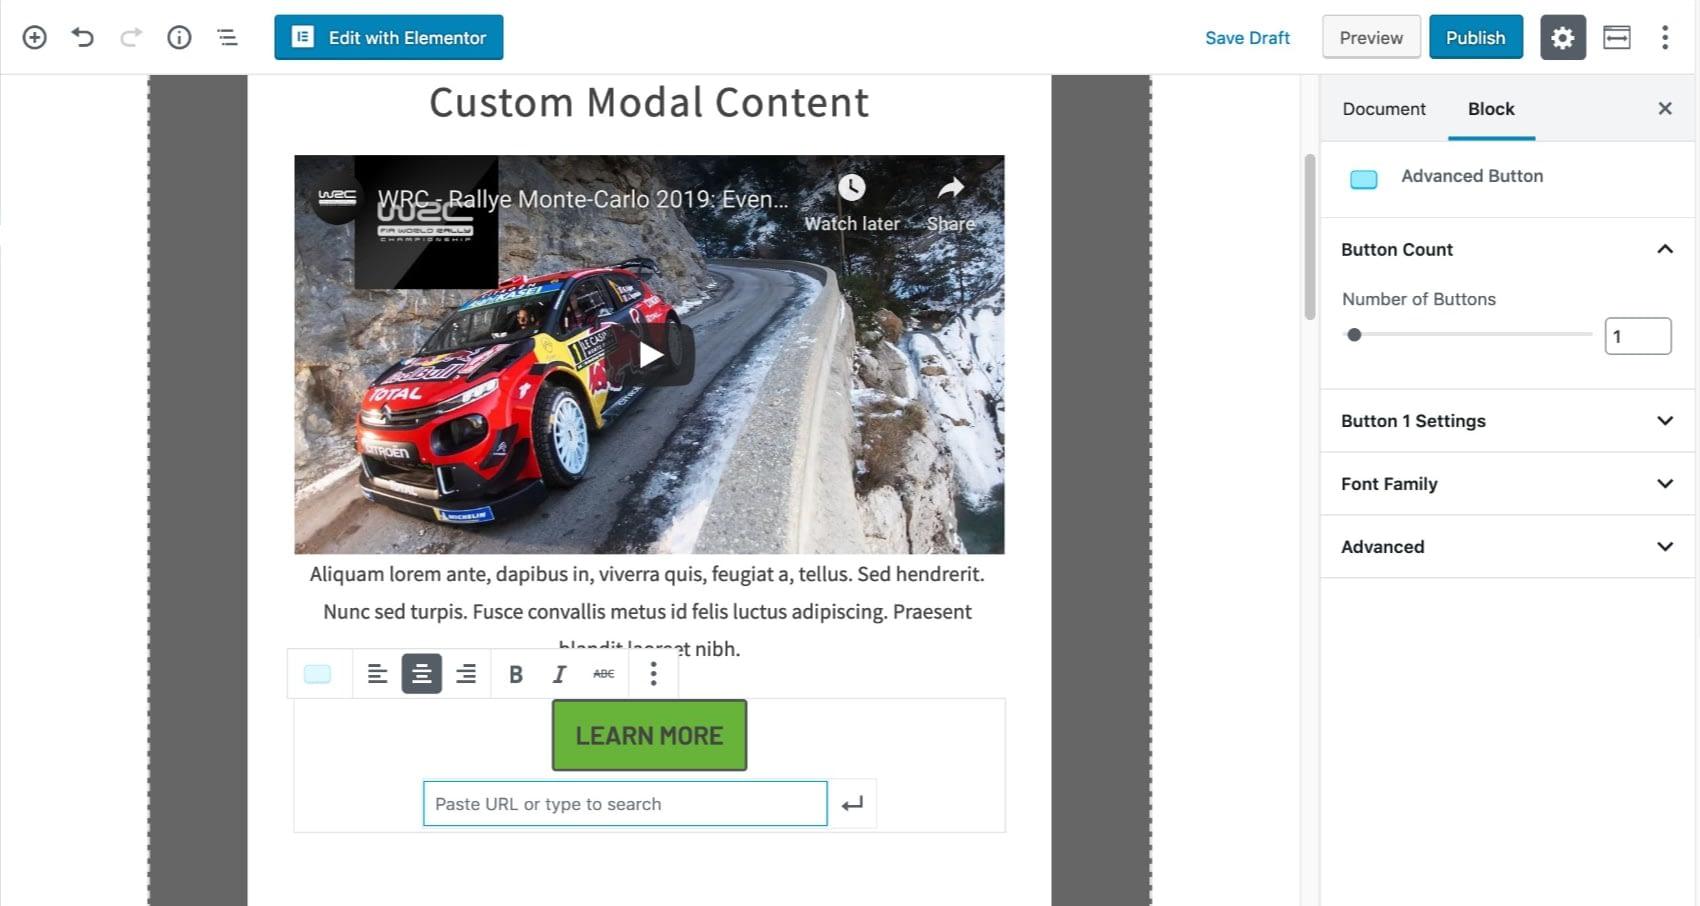 Modal Content